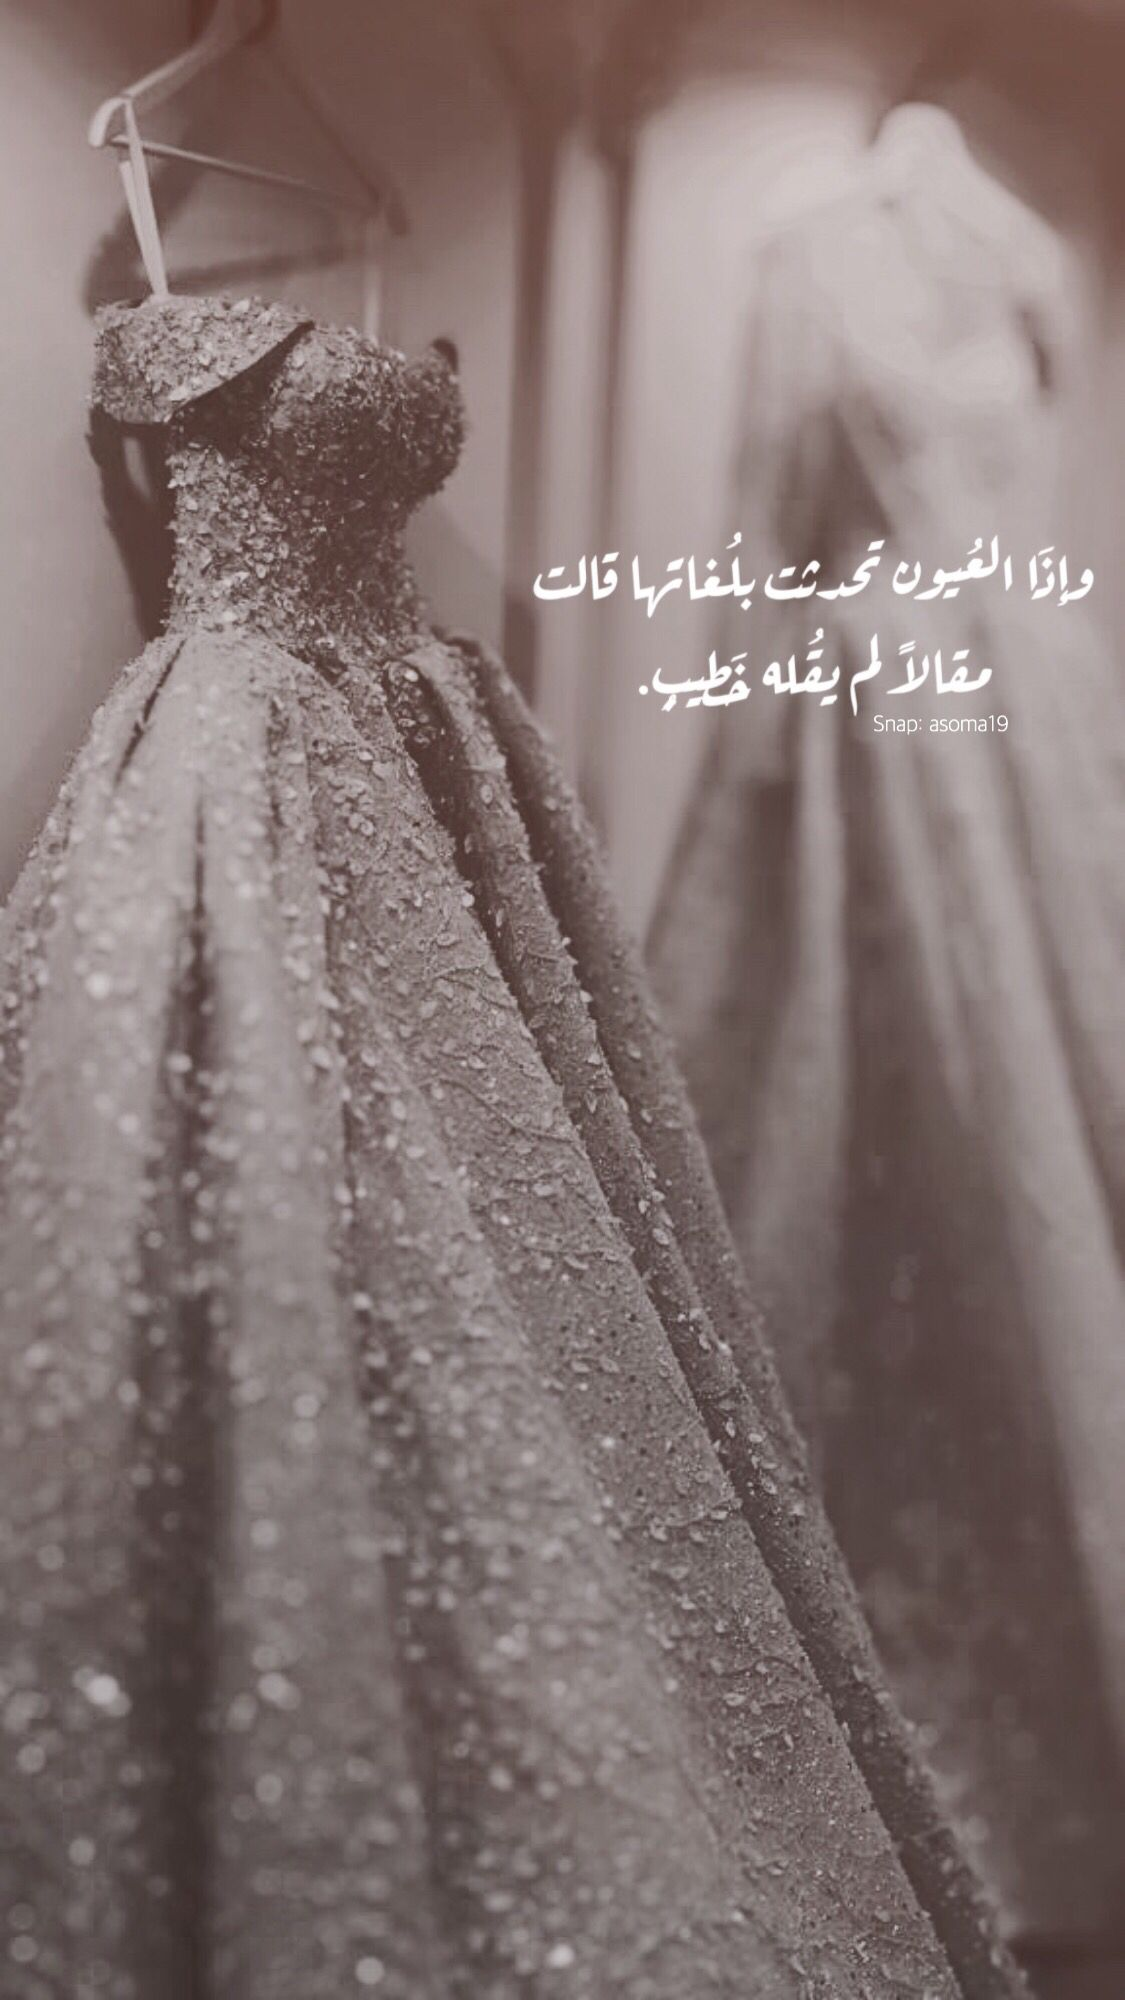 Pin By Zammaanzammaan بغدادية On يوميات Cute Wedding Dress Wedding Dress Silhouette Wedding Dresses